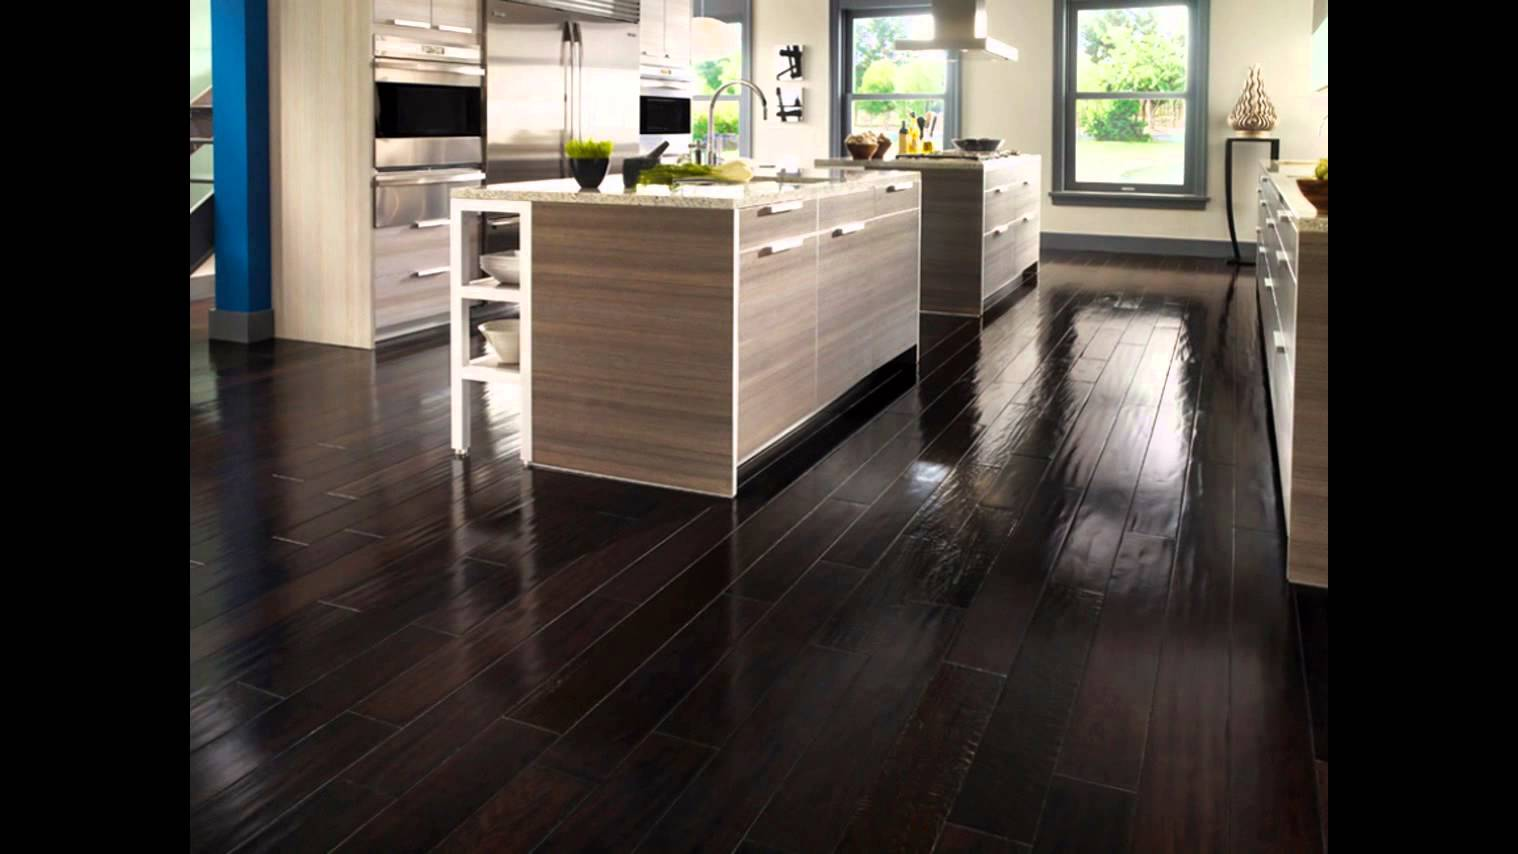 dark wood flooring dark hardwood floors | dark hardwood floors and dark kitchen cabinets HRXUQND